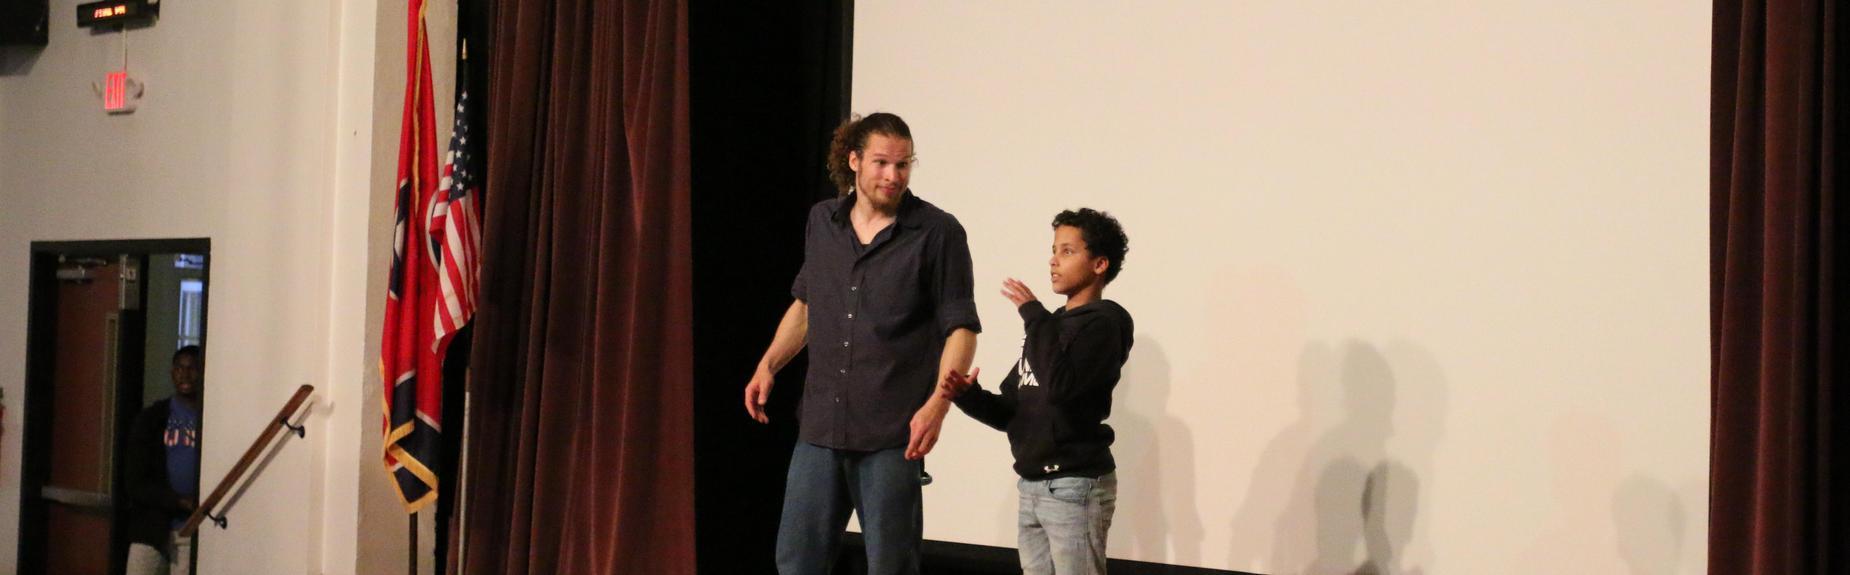 TSD Knoxville ASL Storytelling with Dack Virnig